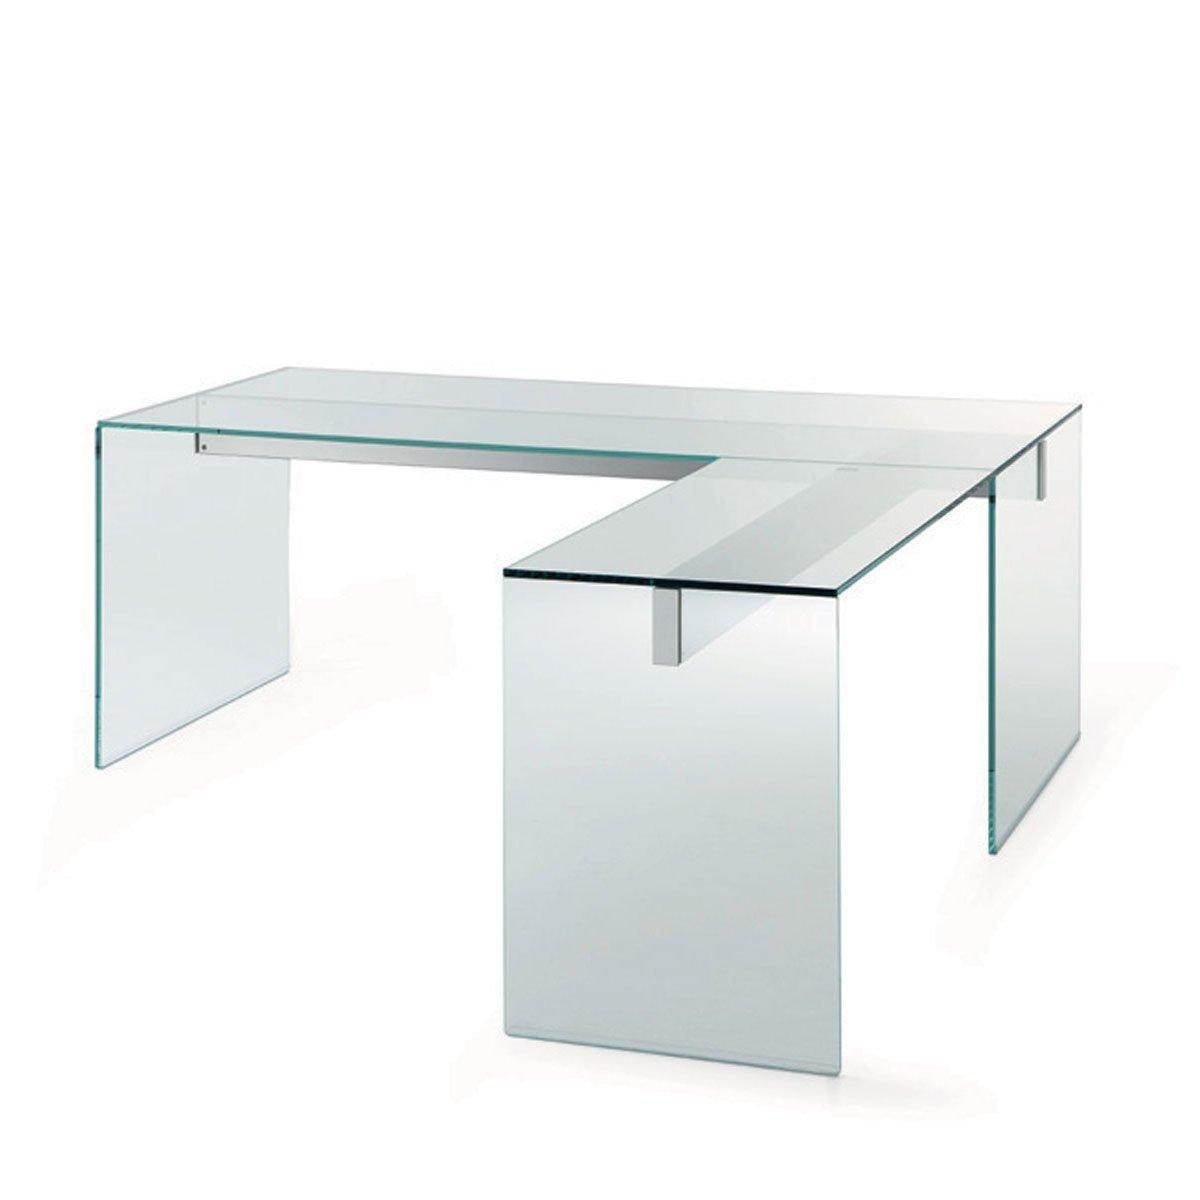 Air Glass Desk L By Gallotti  Radice  Klarity  Glass